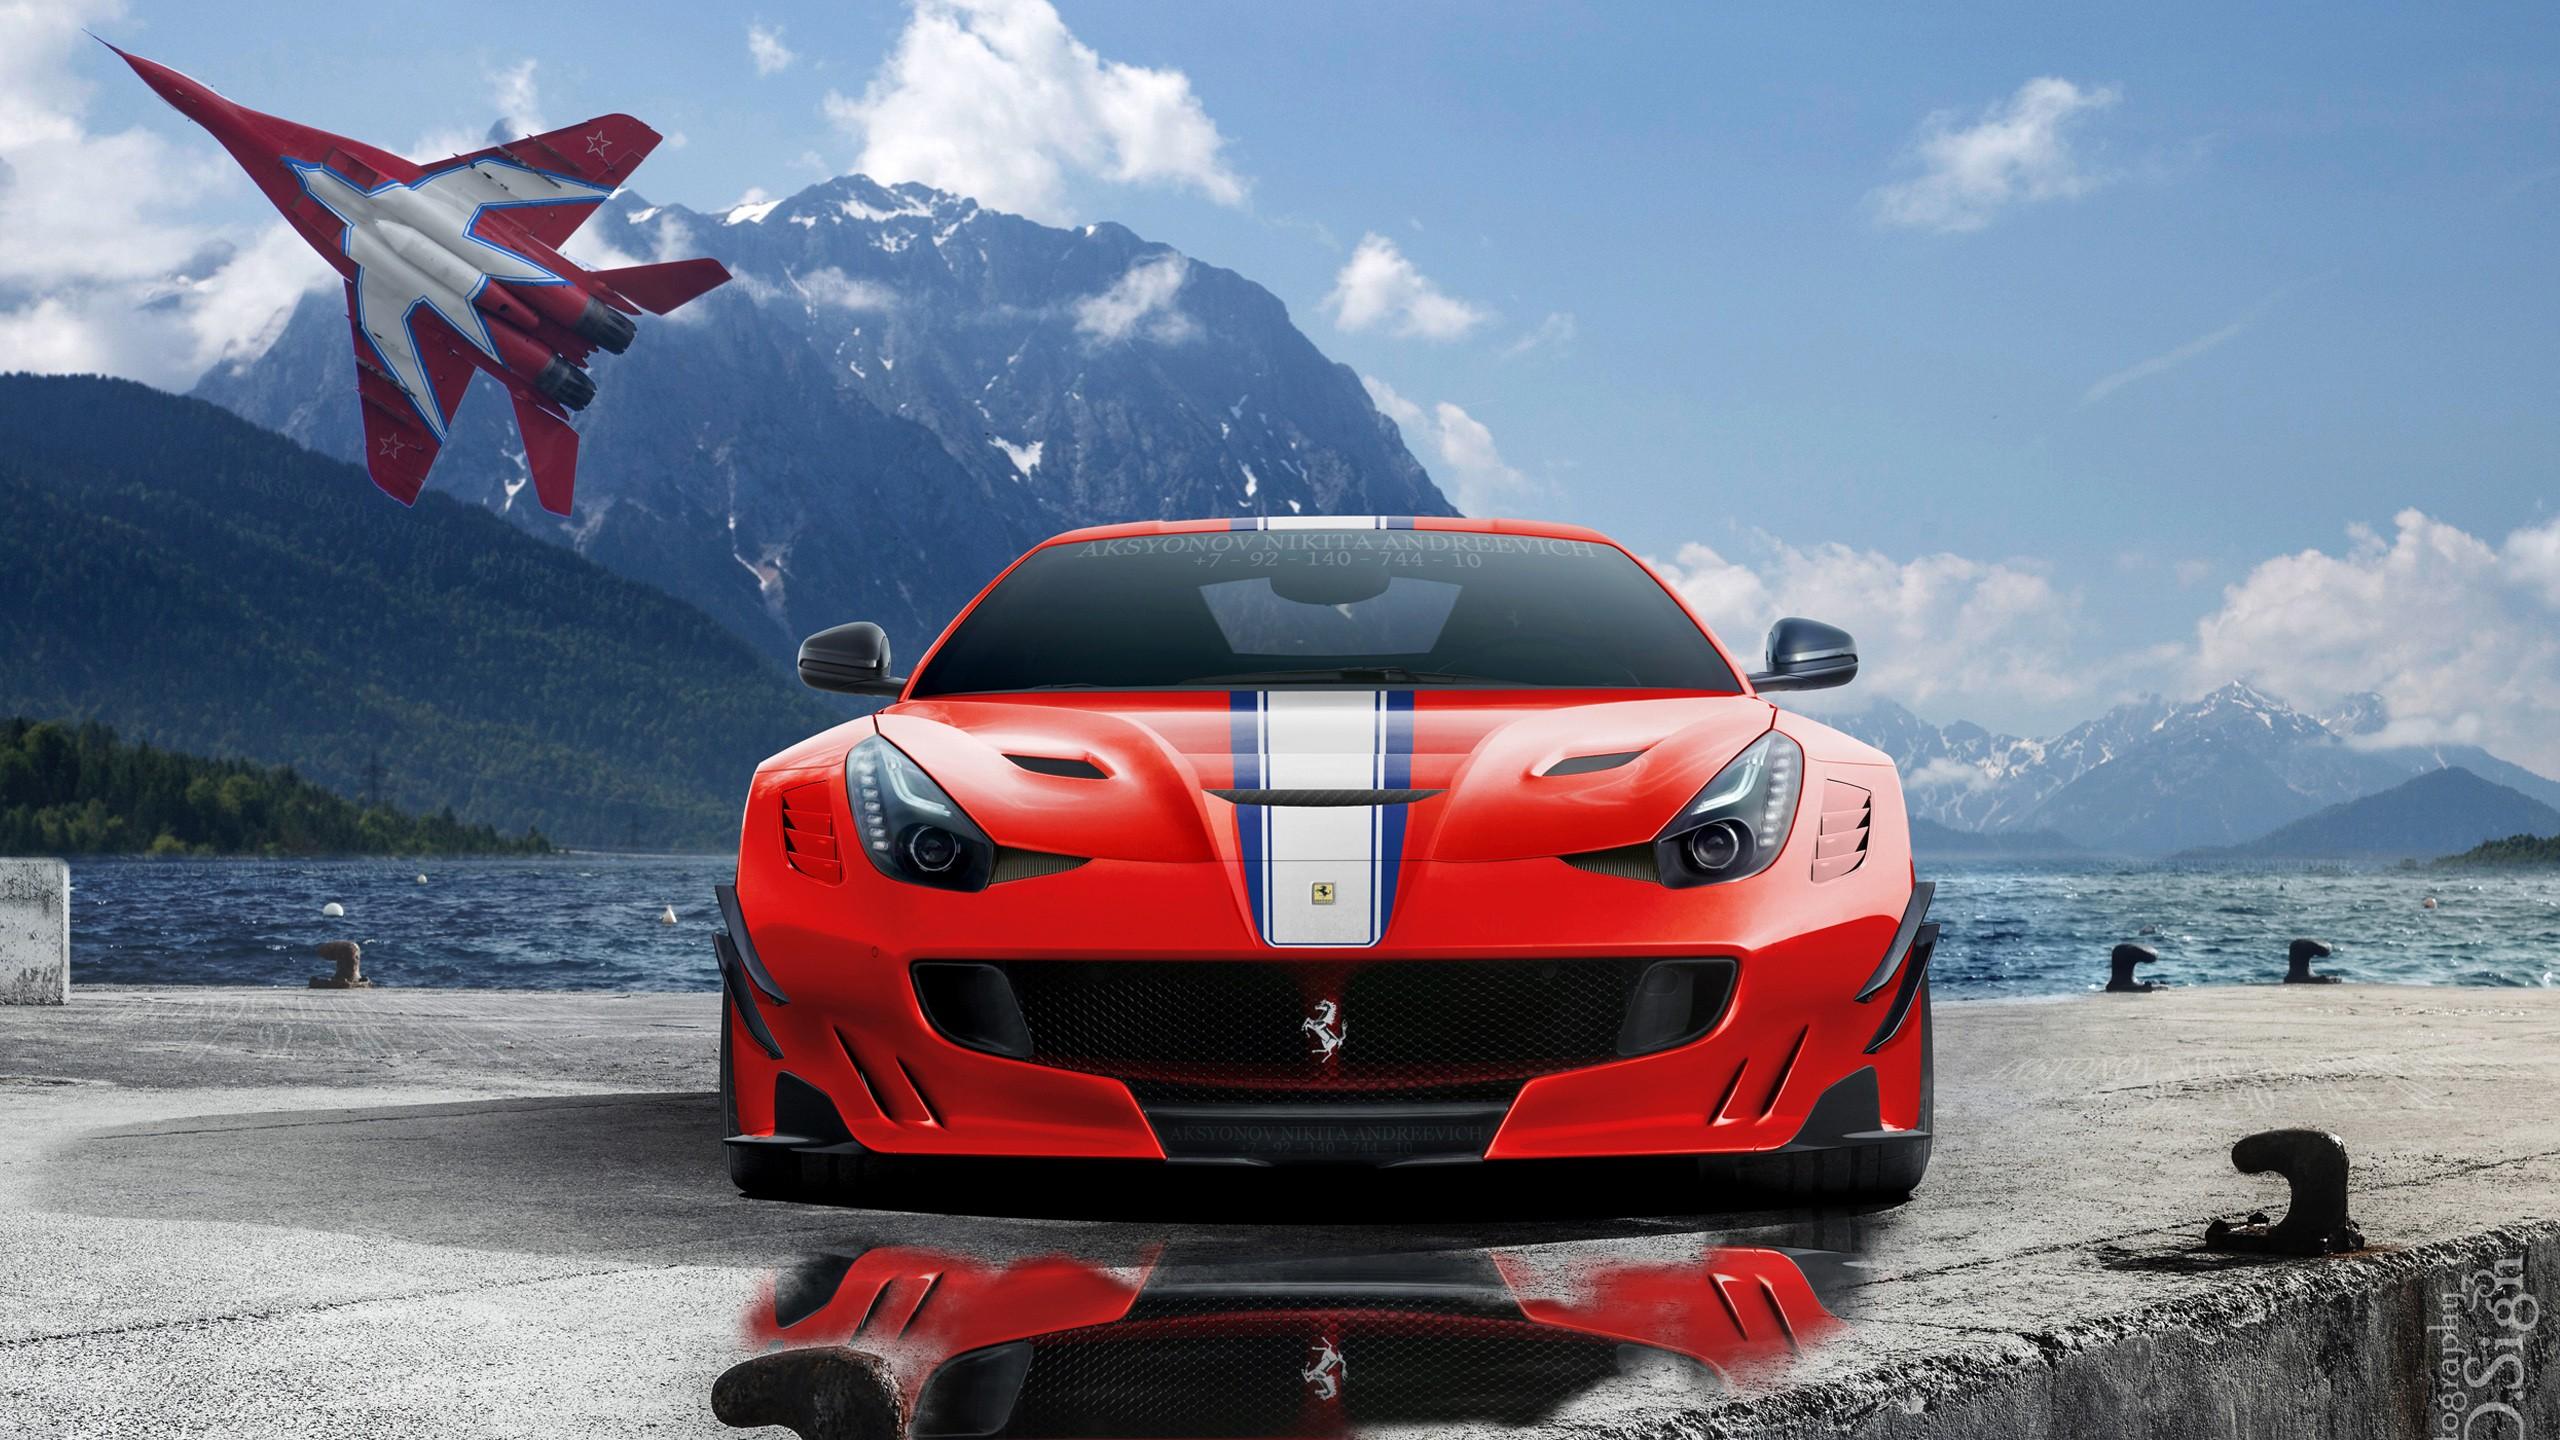 Ferrari 458 Speciale Hd Wallpaper F12 Ferrari F12tdf Speciale Wallpaper Hd Car Wallpapers